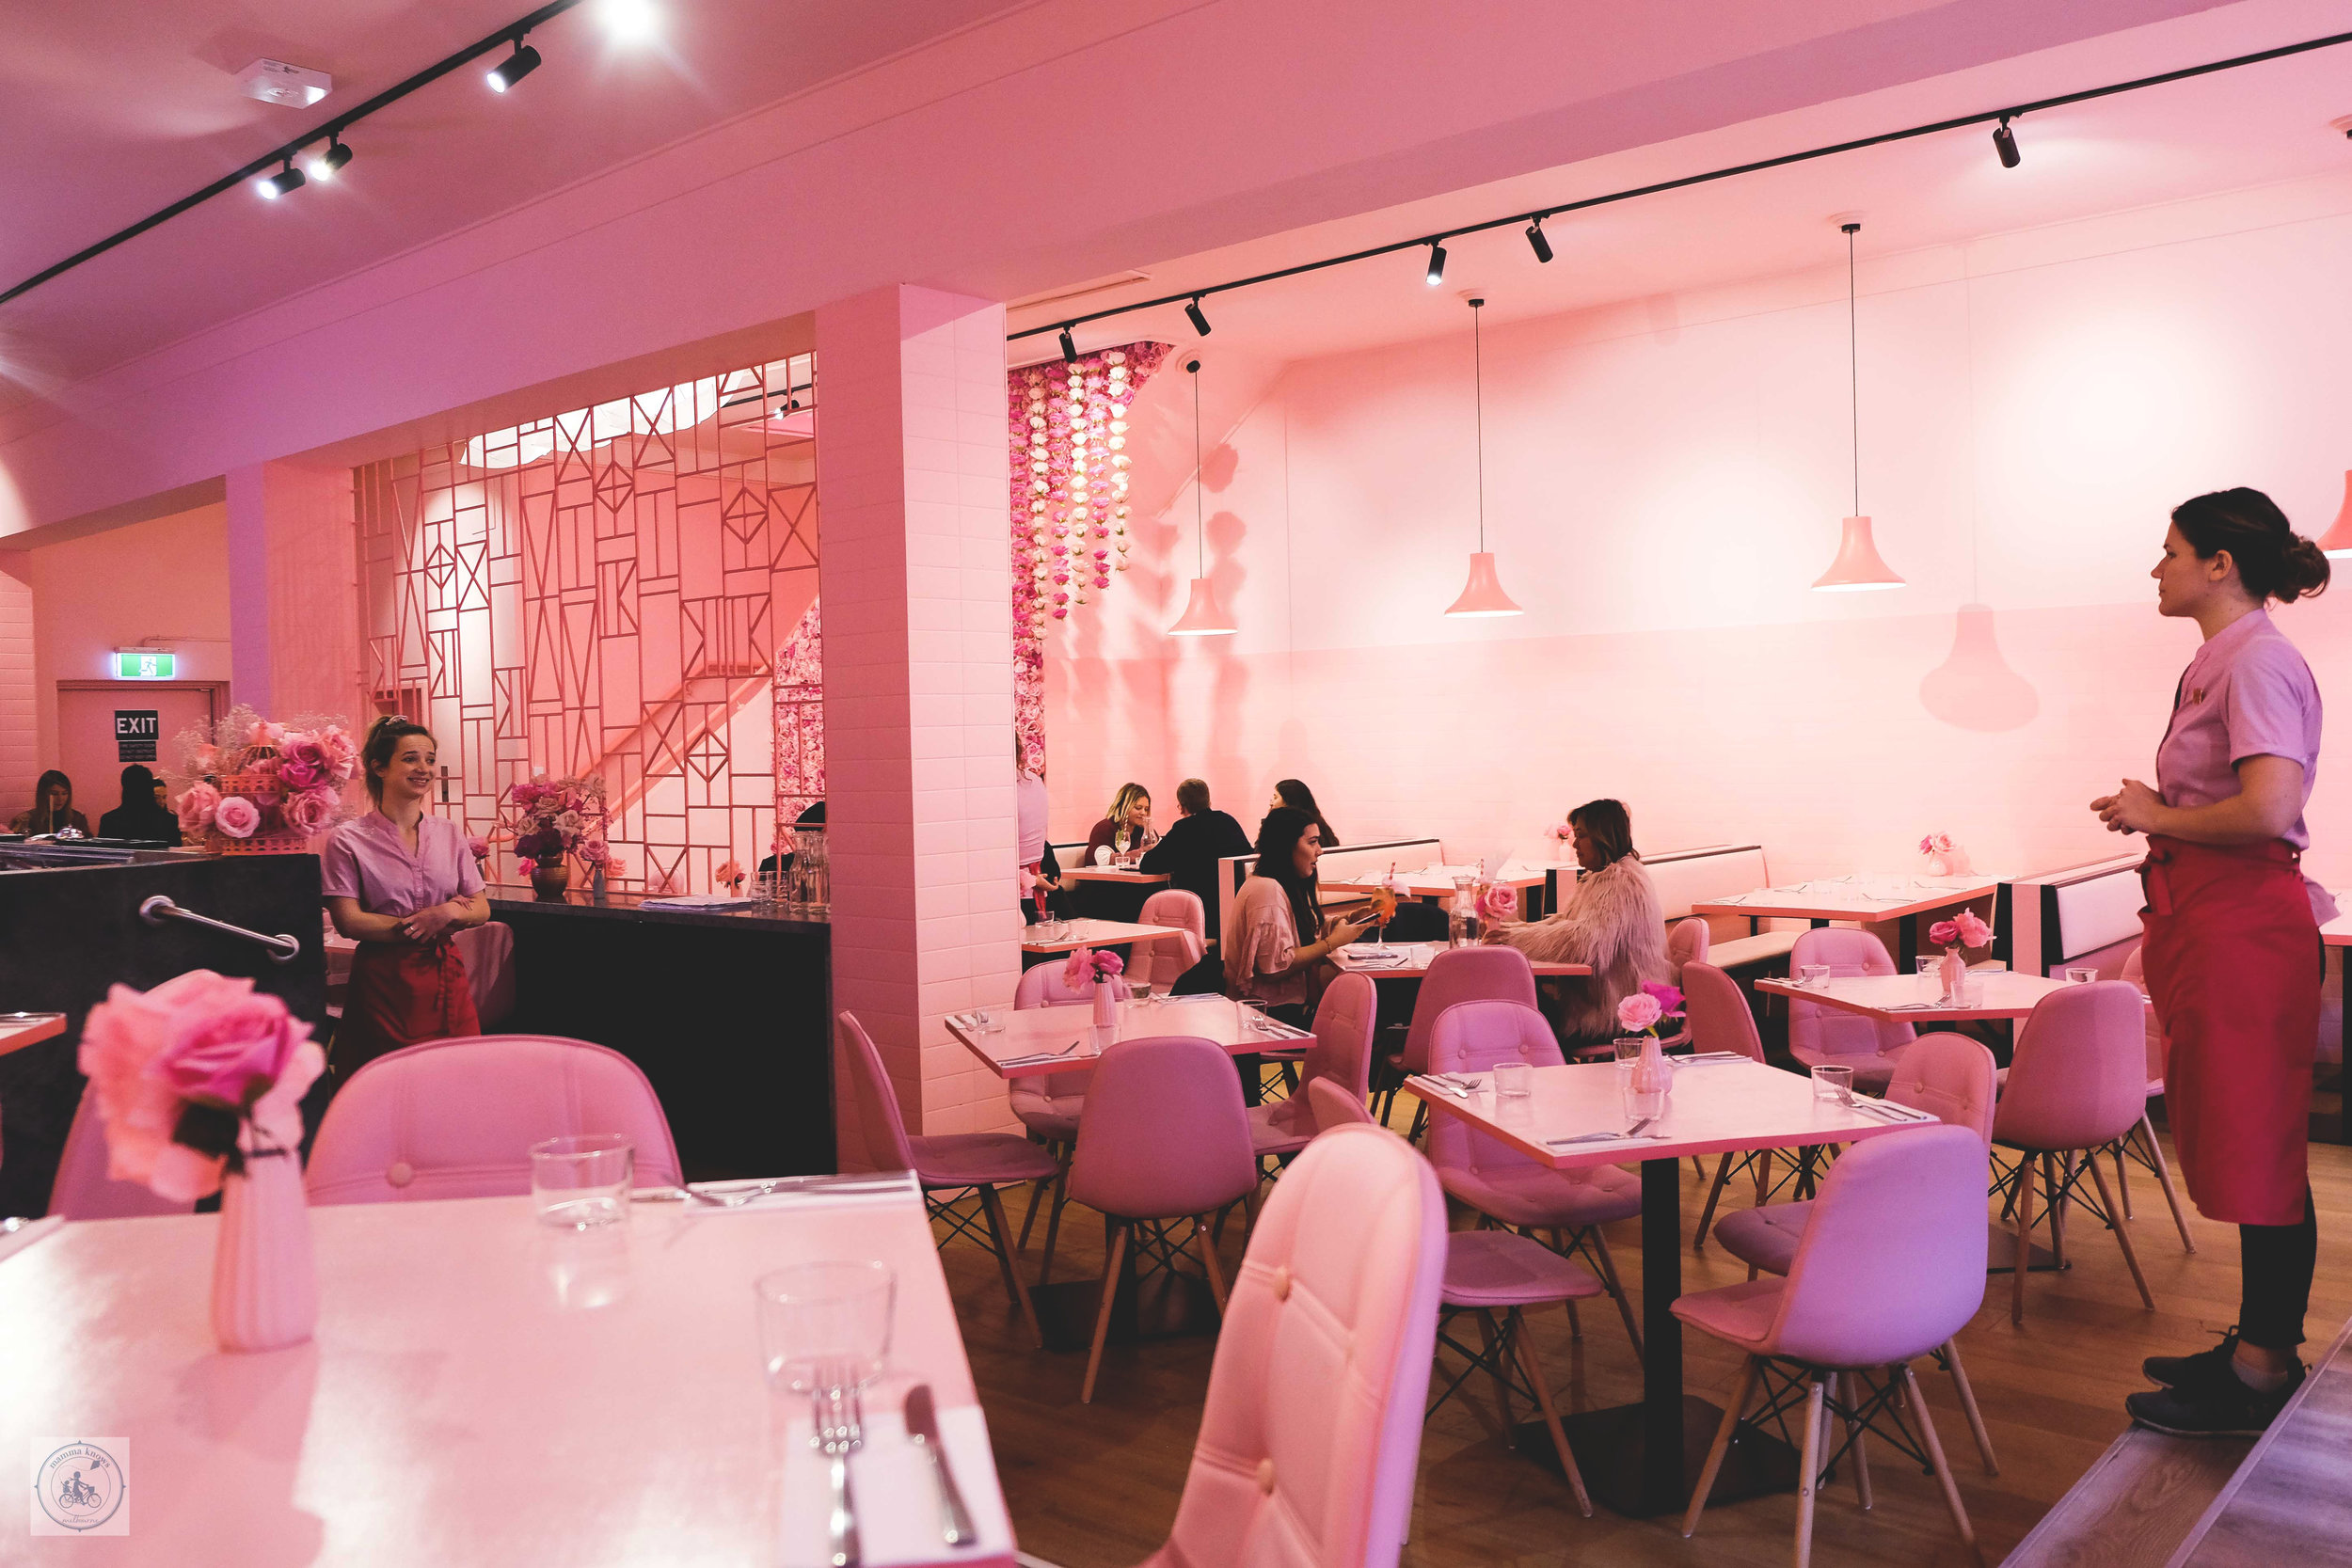 pink the restaurant, melbourne  - mamma knows melbourne